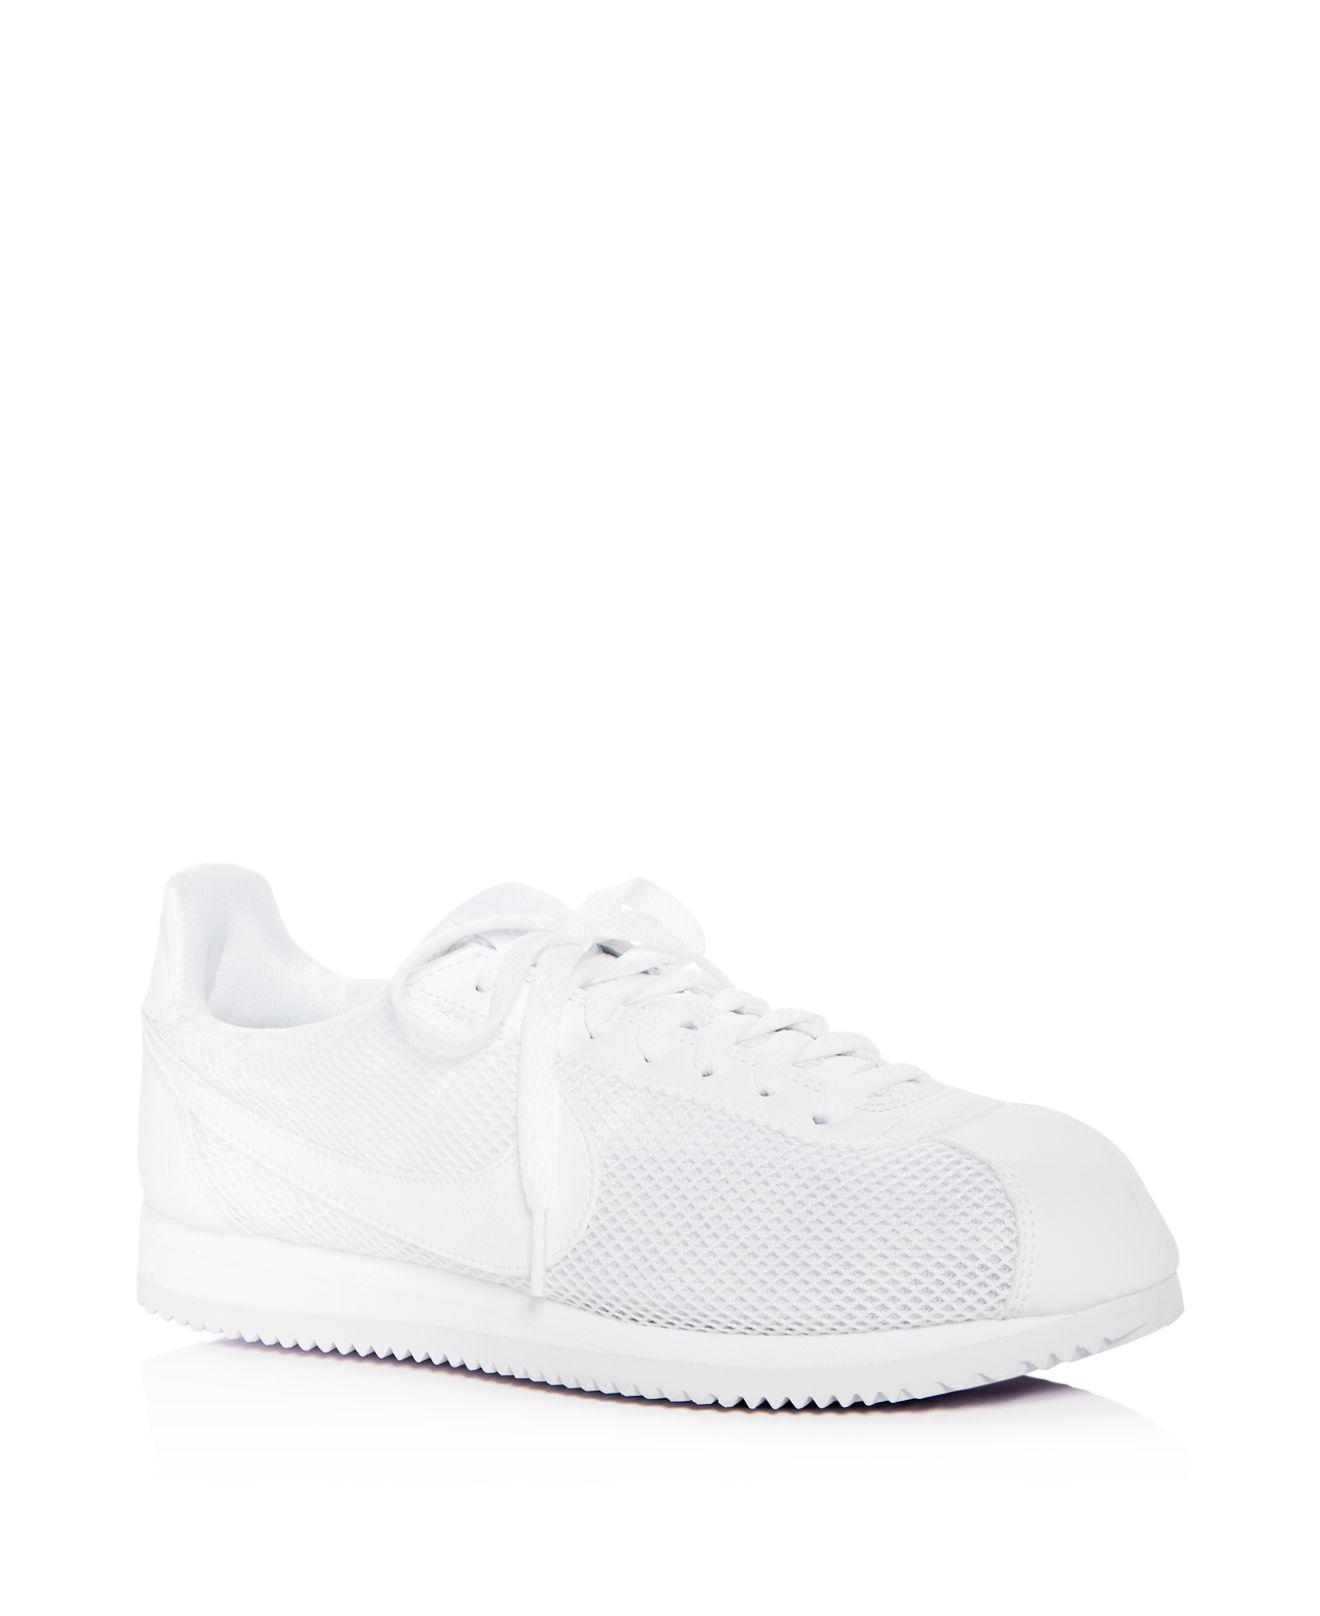 Nike Women's Classic Cortez Mesh Lace Up Sneakers 2pbk1uB